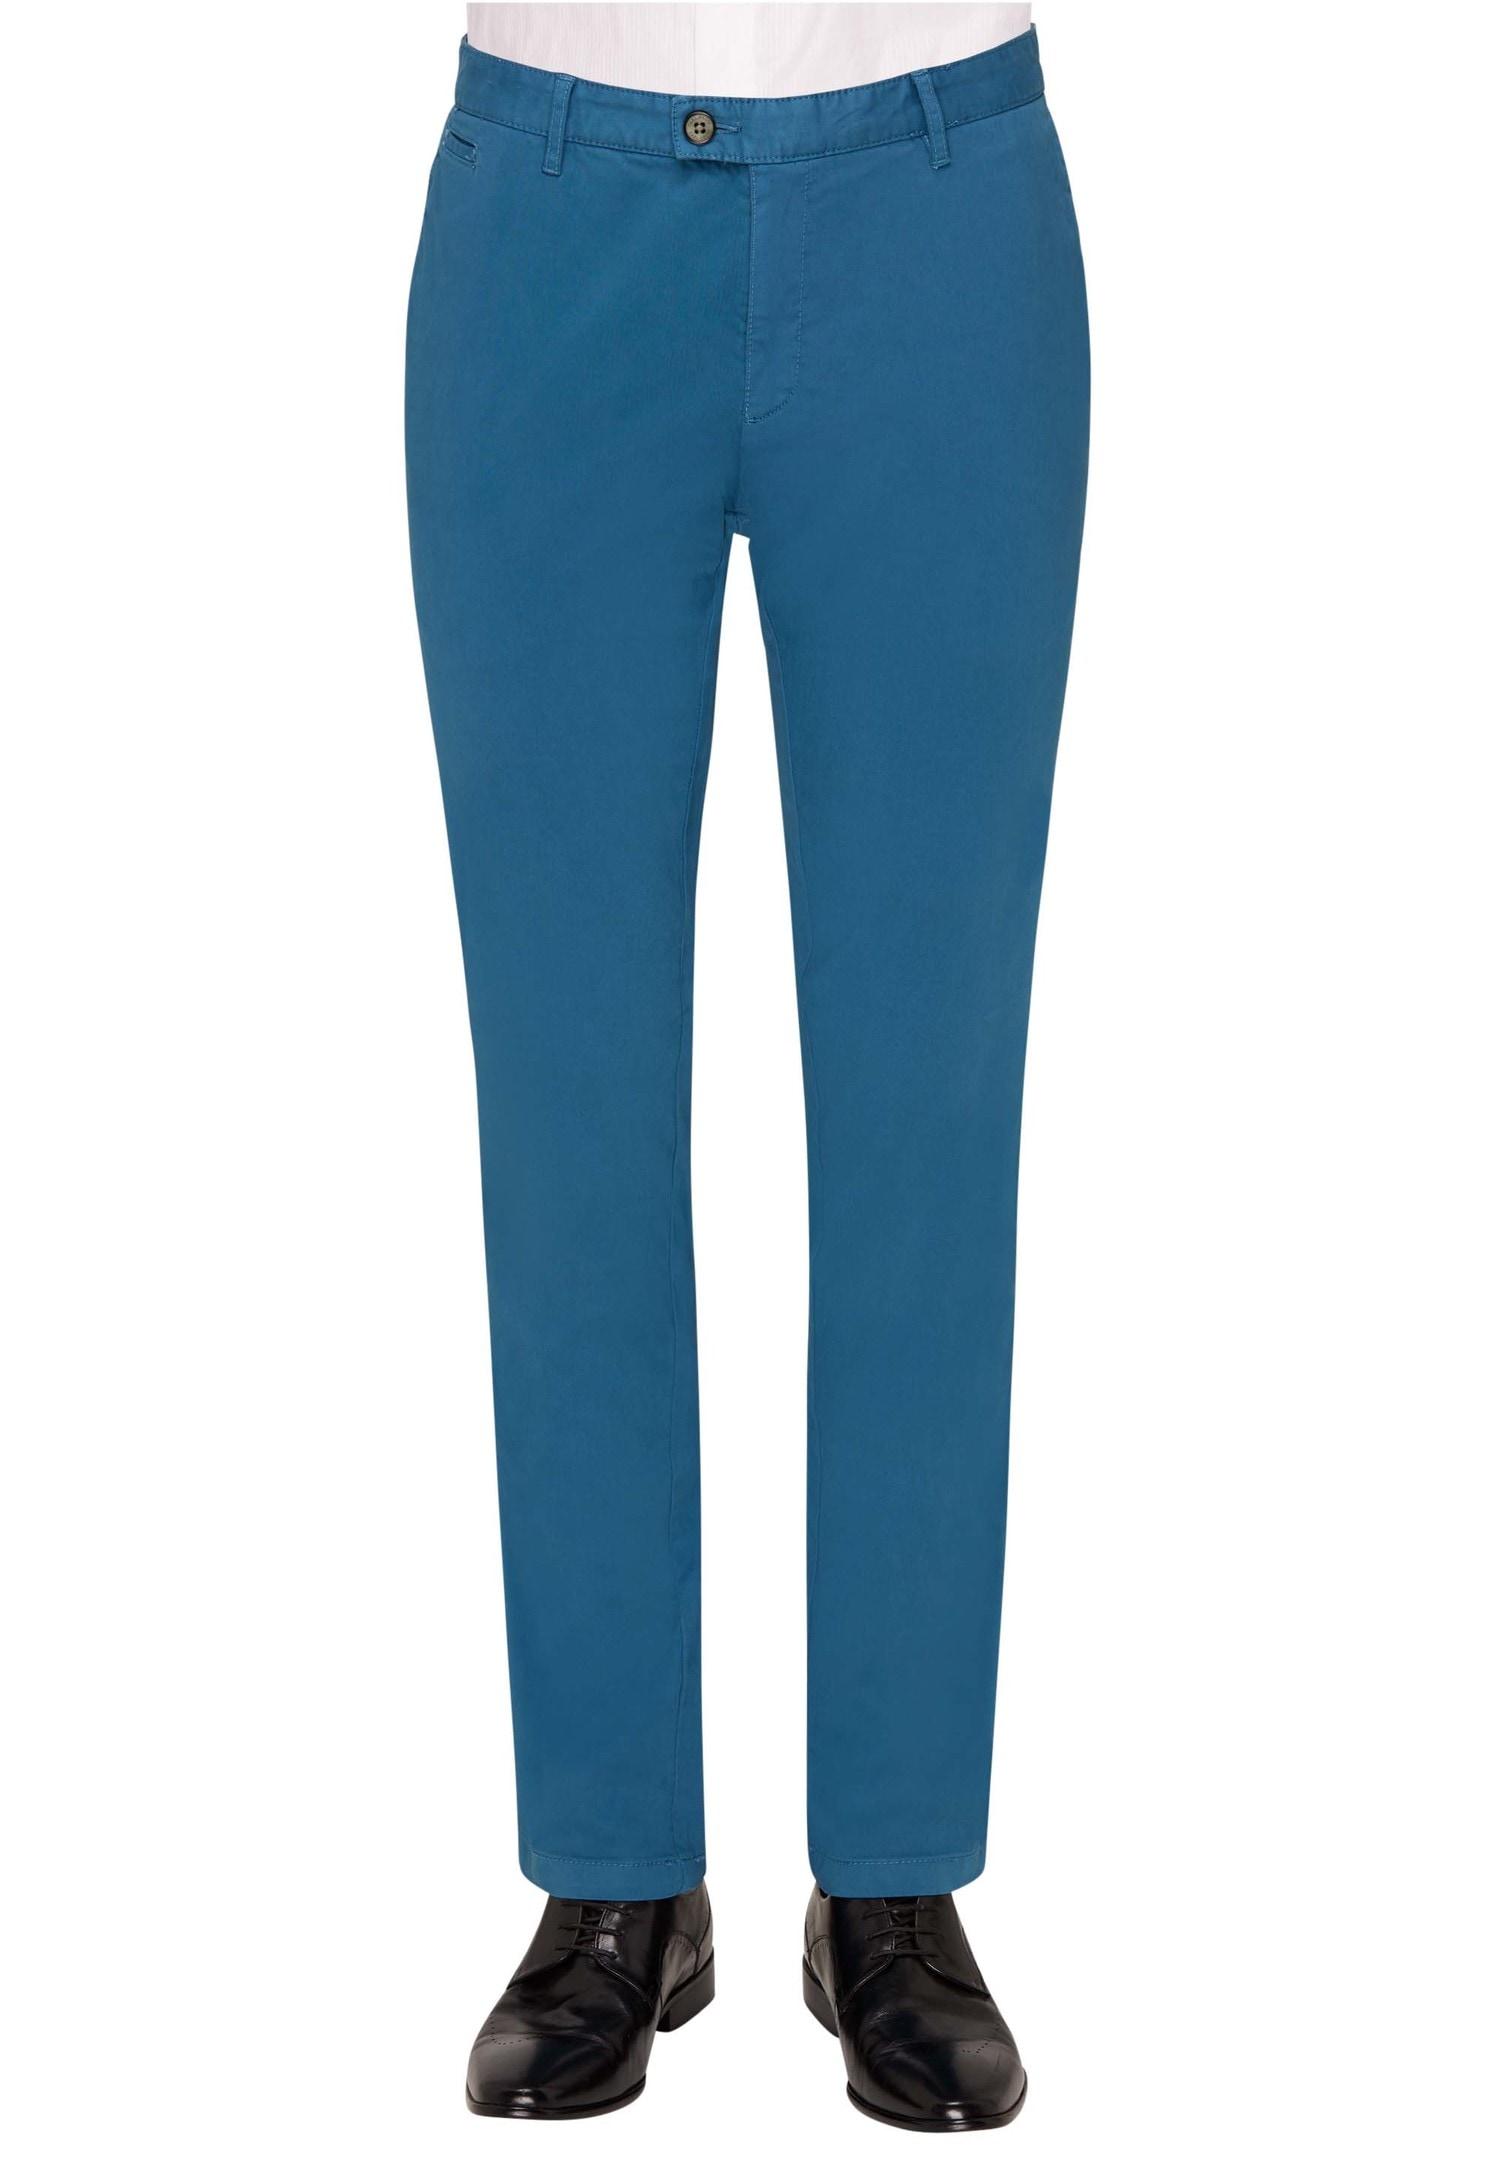 Carl Gross Hose aus elastischer Baumwolle CG Rene | Bekleidung > Hosen > Sonstige Hosen | Blau | carl gross